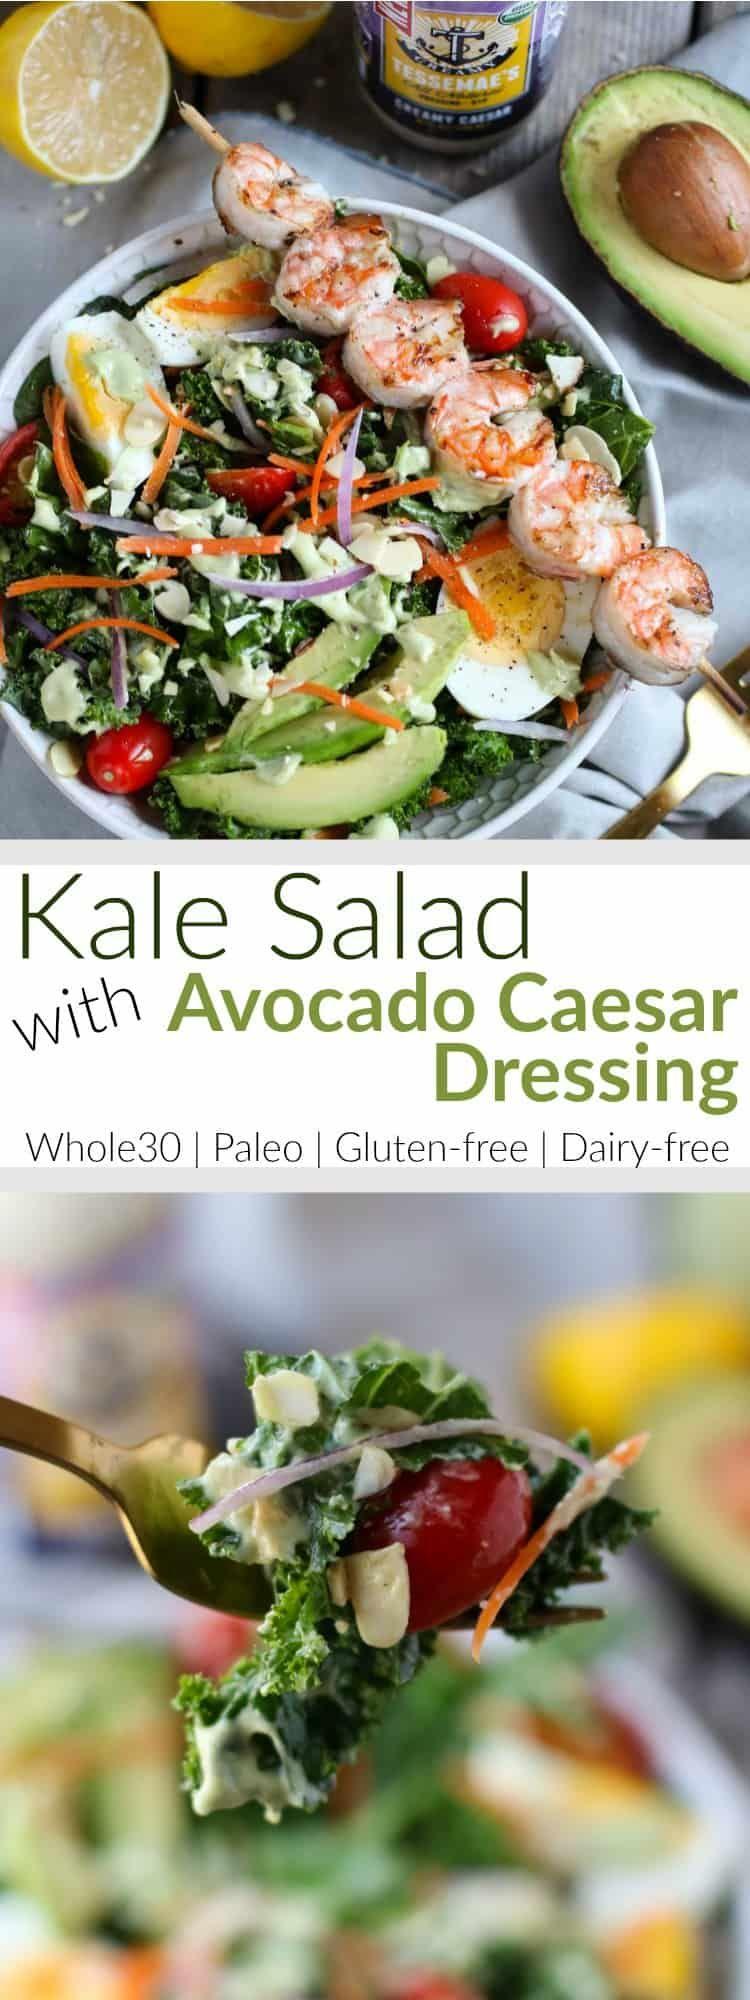 kale salad with avocado caesar dressing  recipe  kale